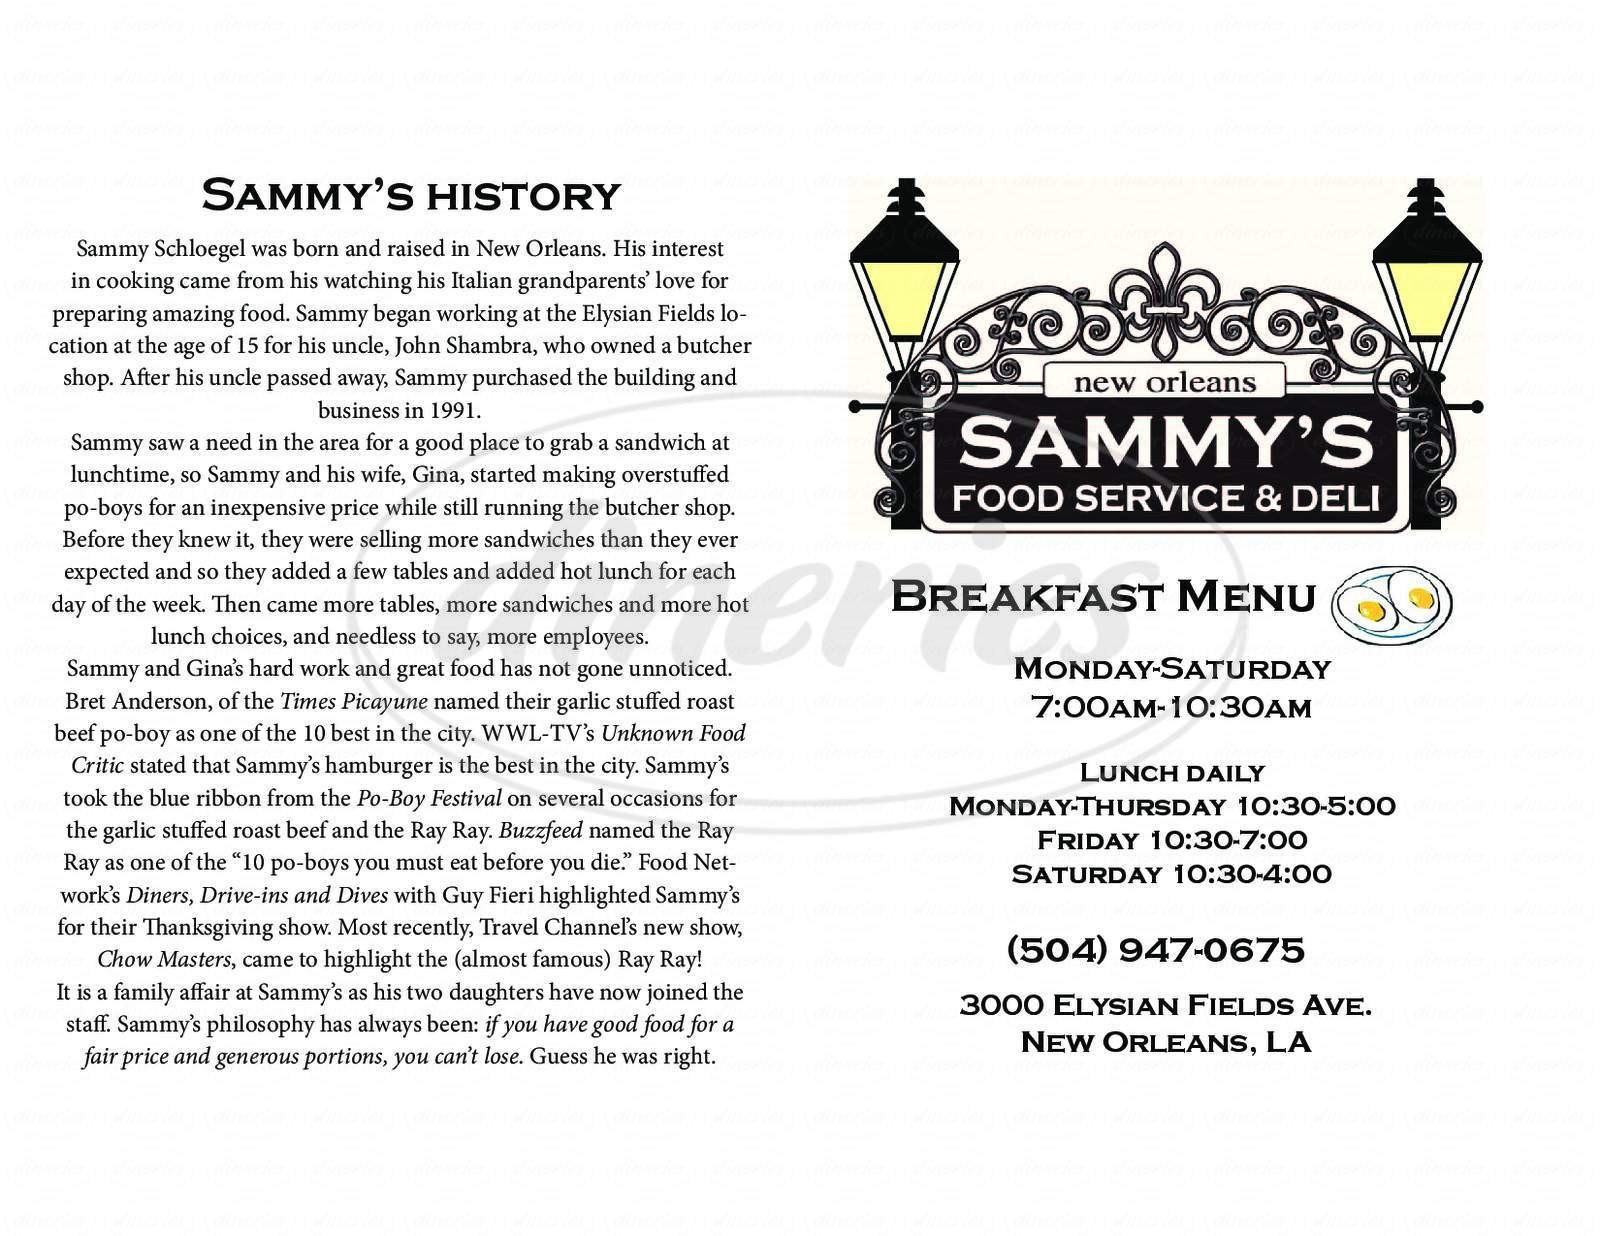 menu for Sammy's Food Service & Deli